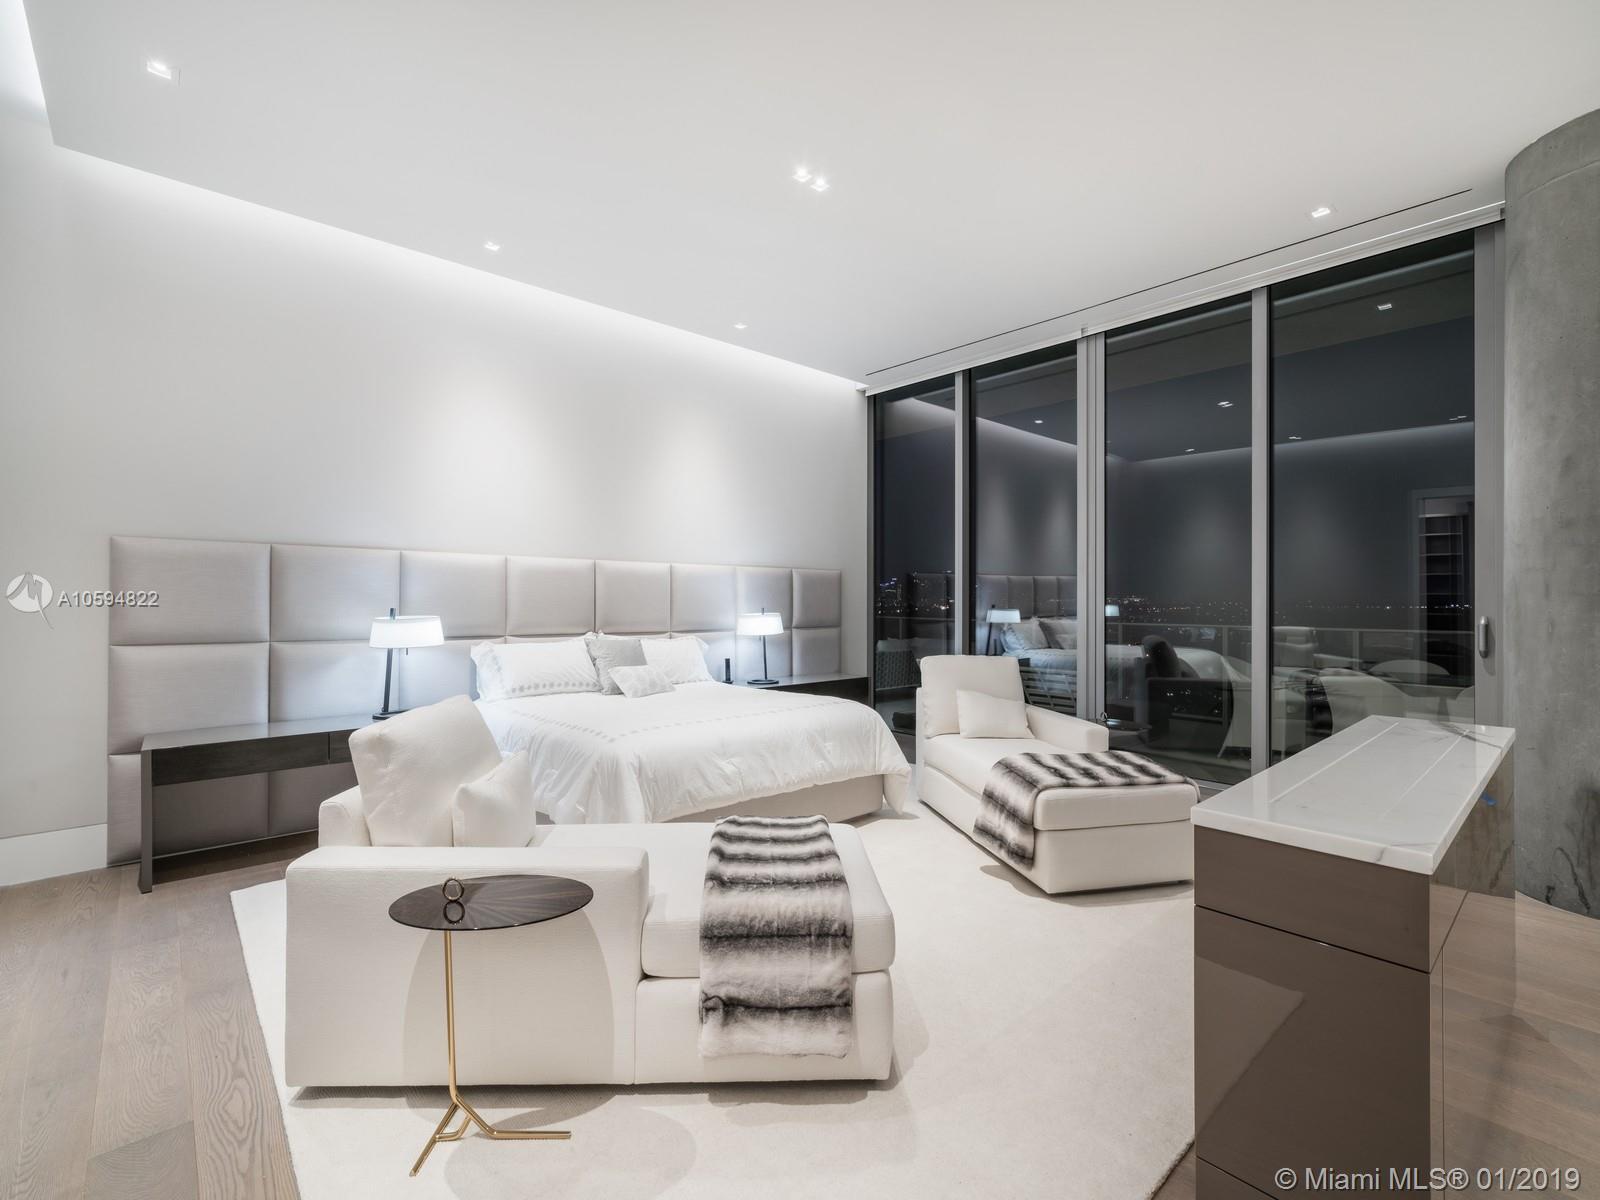 Аренда квартиры по адресу 2675 Bayshore Dr, Miami, FL 33133 в США